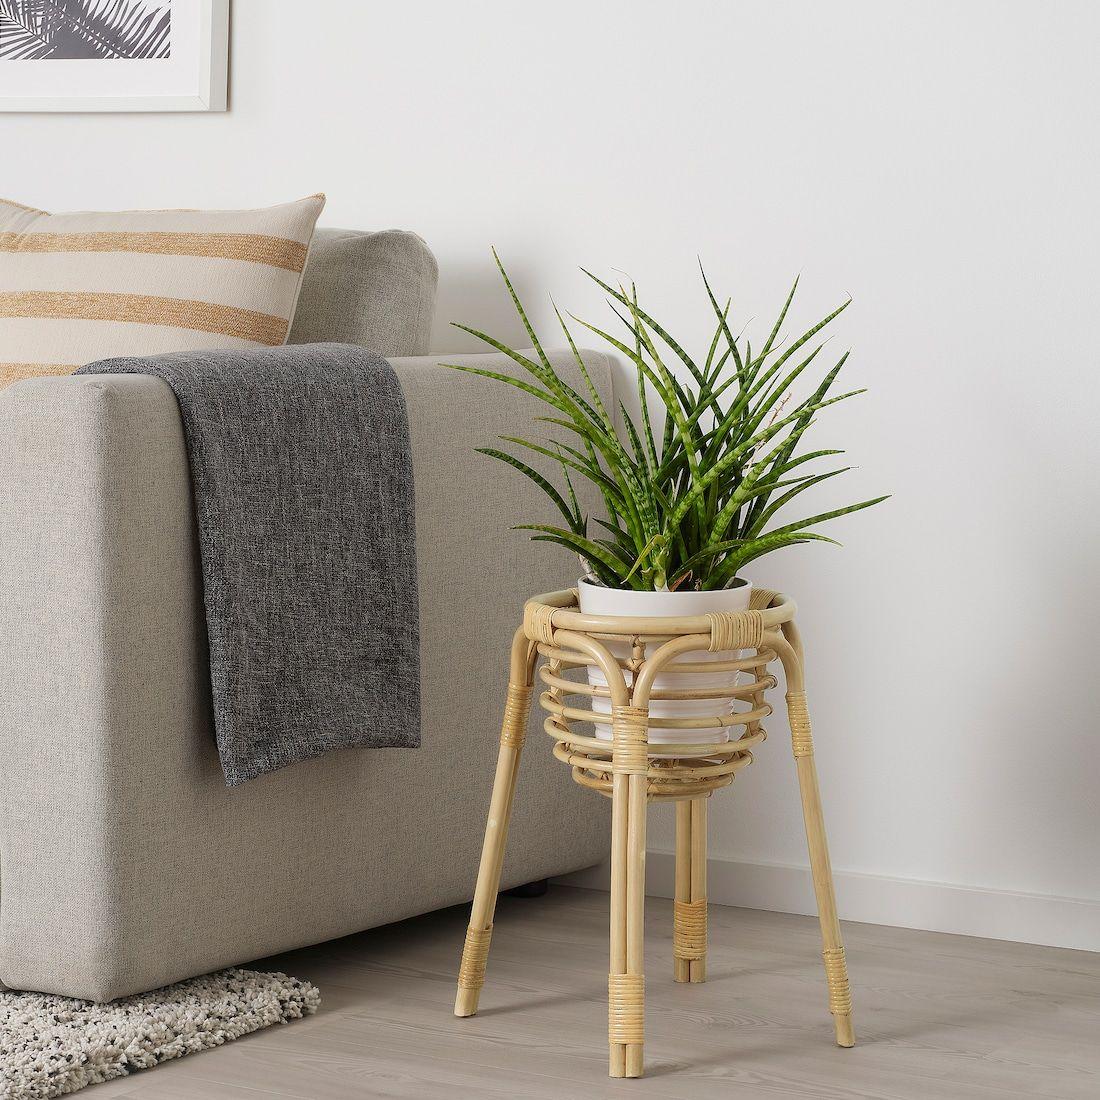 Buskbo Kukkajalka Rottinkia Ikea Support Pour Plante Ikea Carrelage De Salle De Bains Moderne